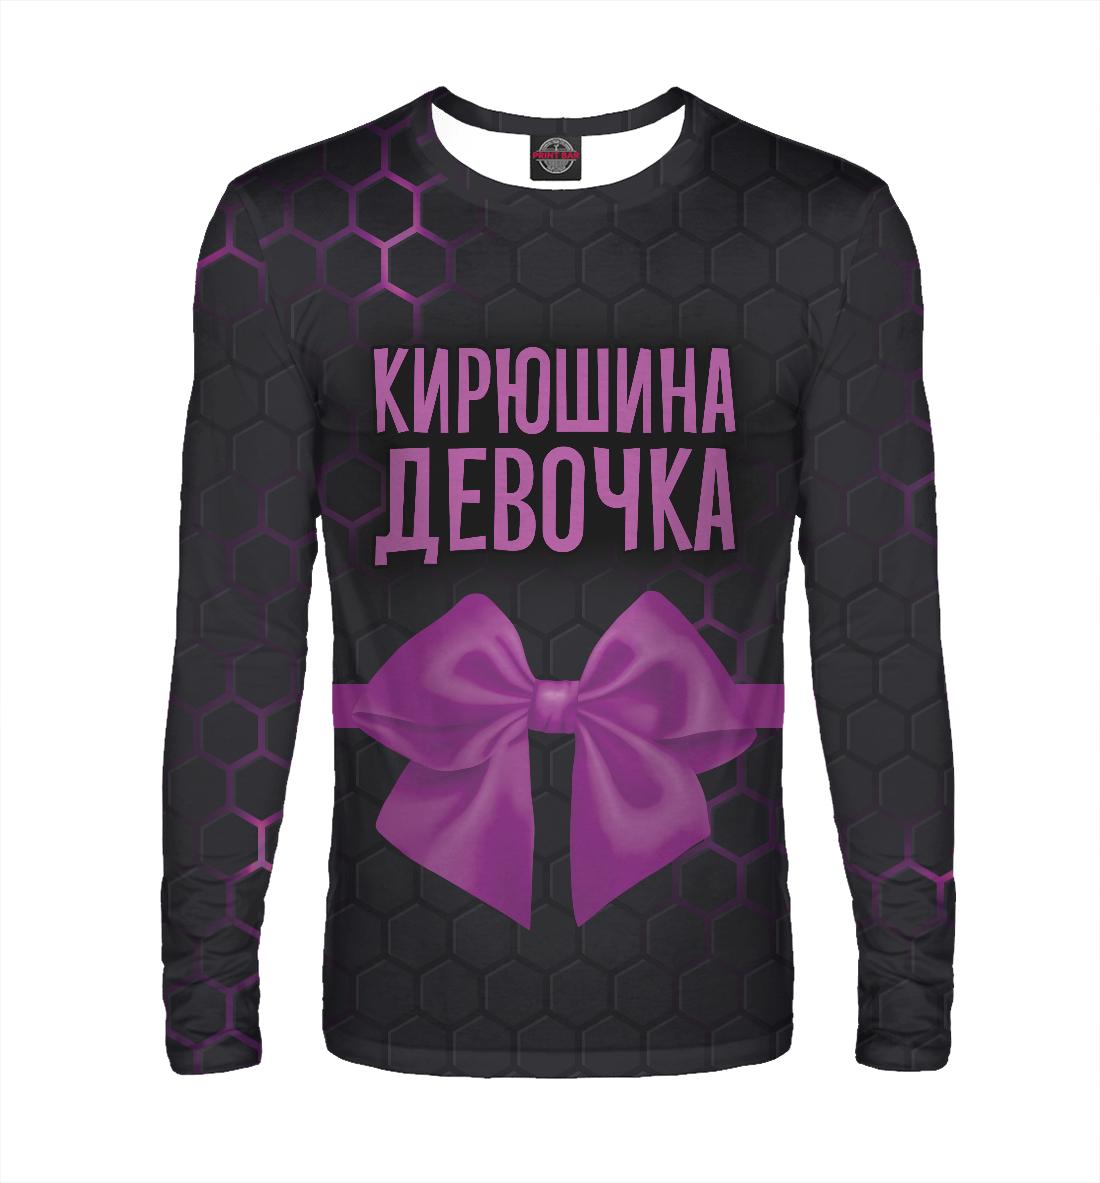 Лонгслив Кирюшина девочка